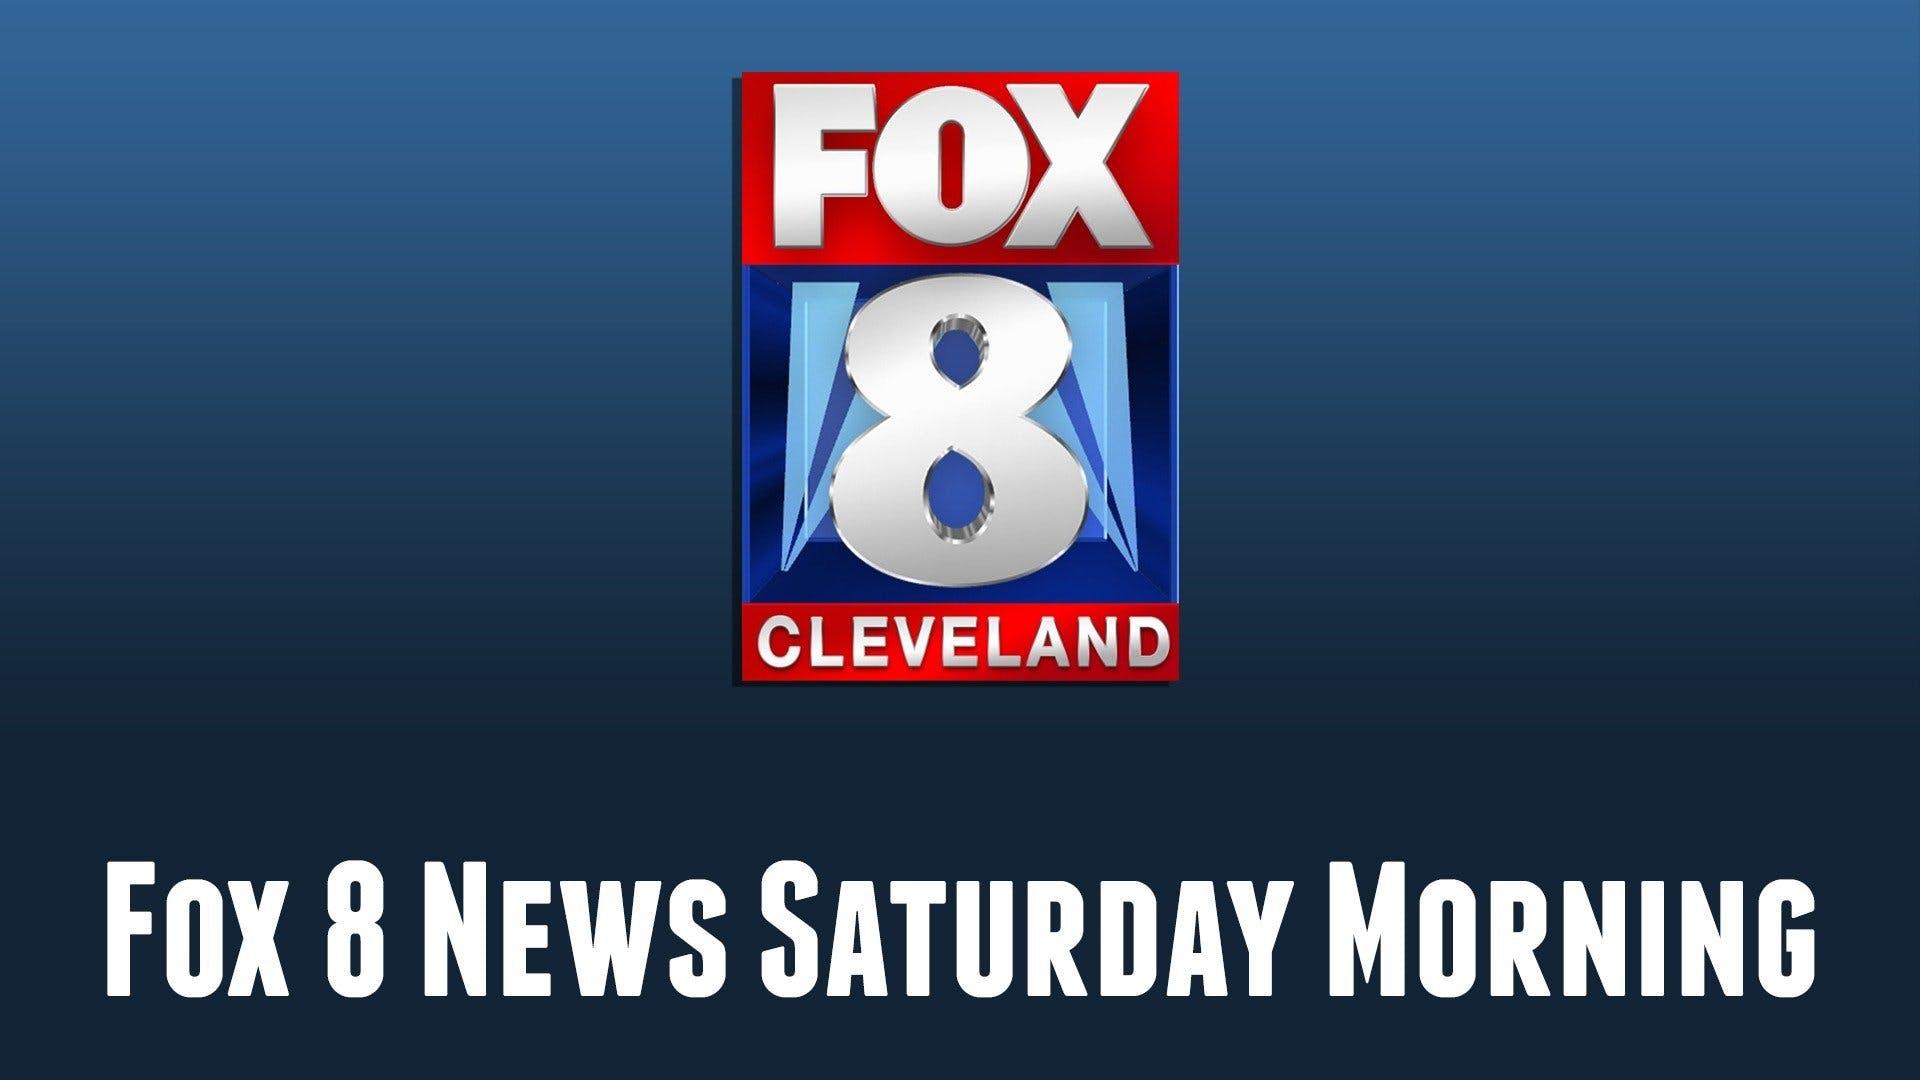 Watch Fox 8 News Saturday Morning | Stream on fuboTV (Free